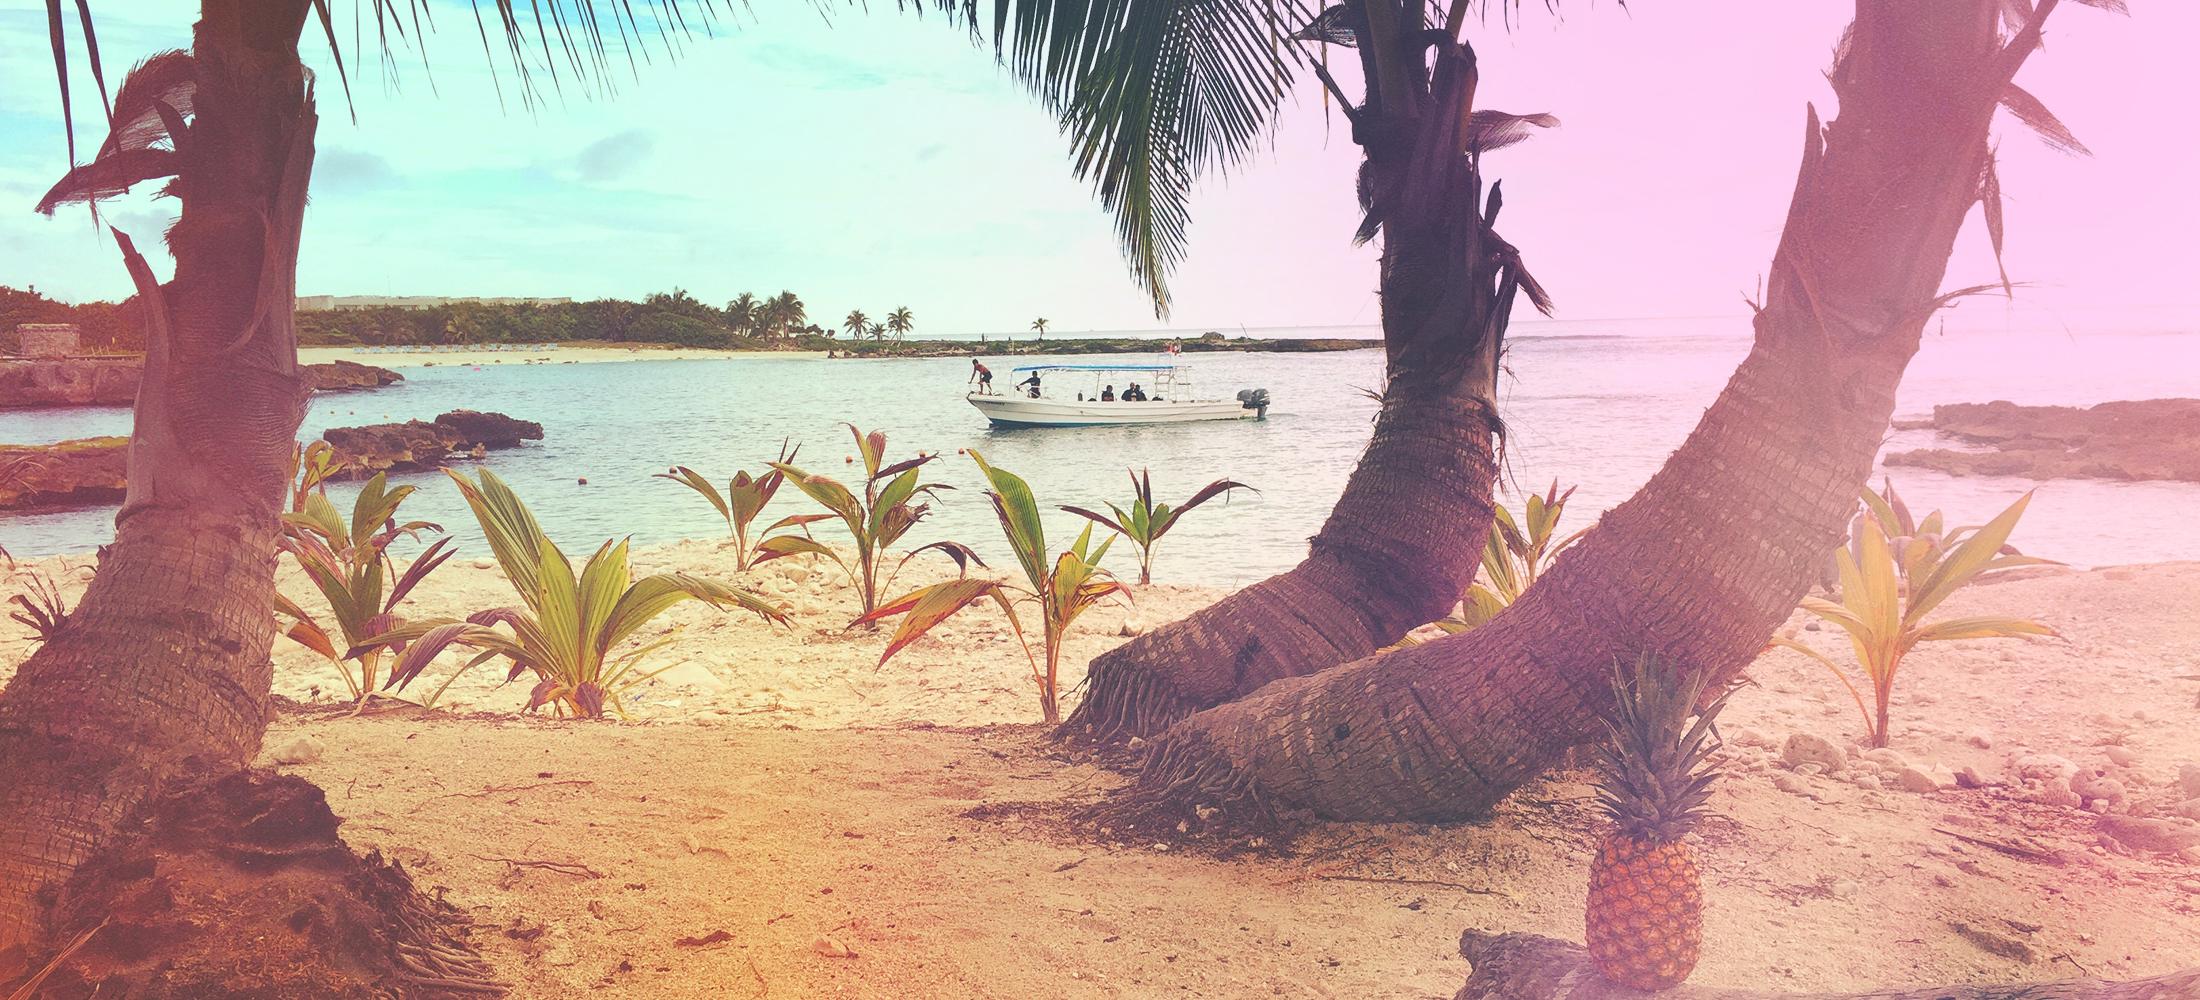 Mandami beach